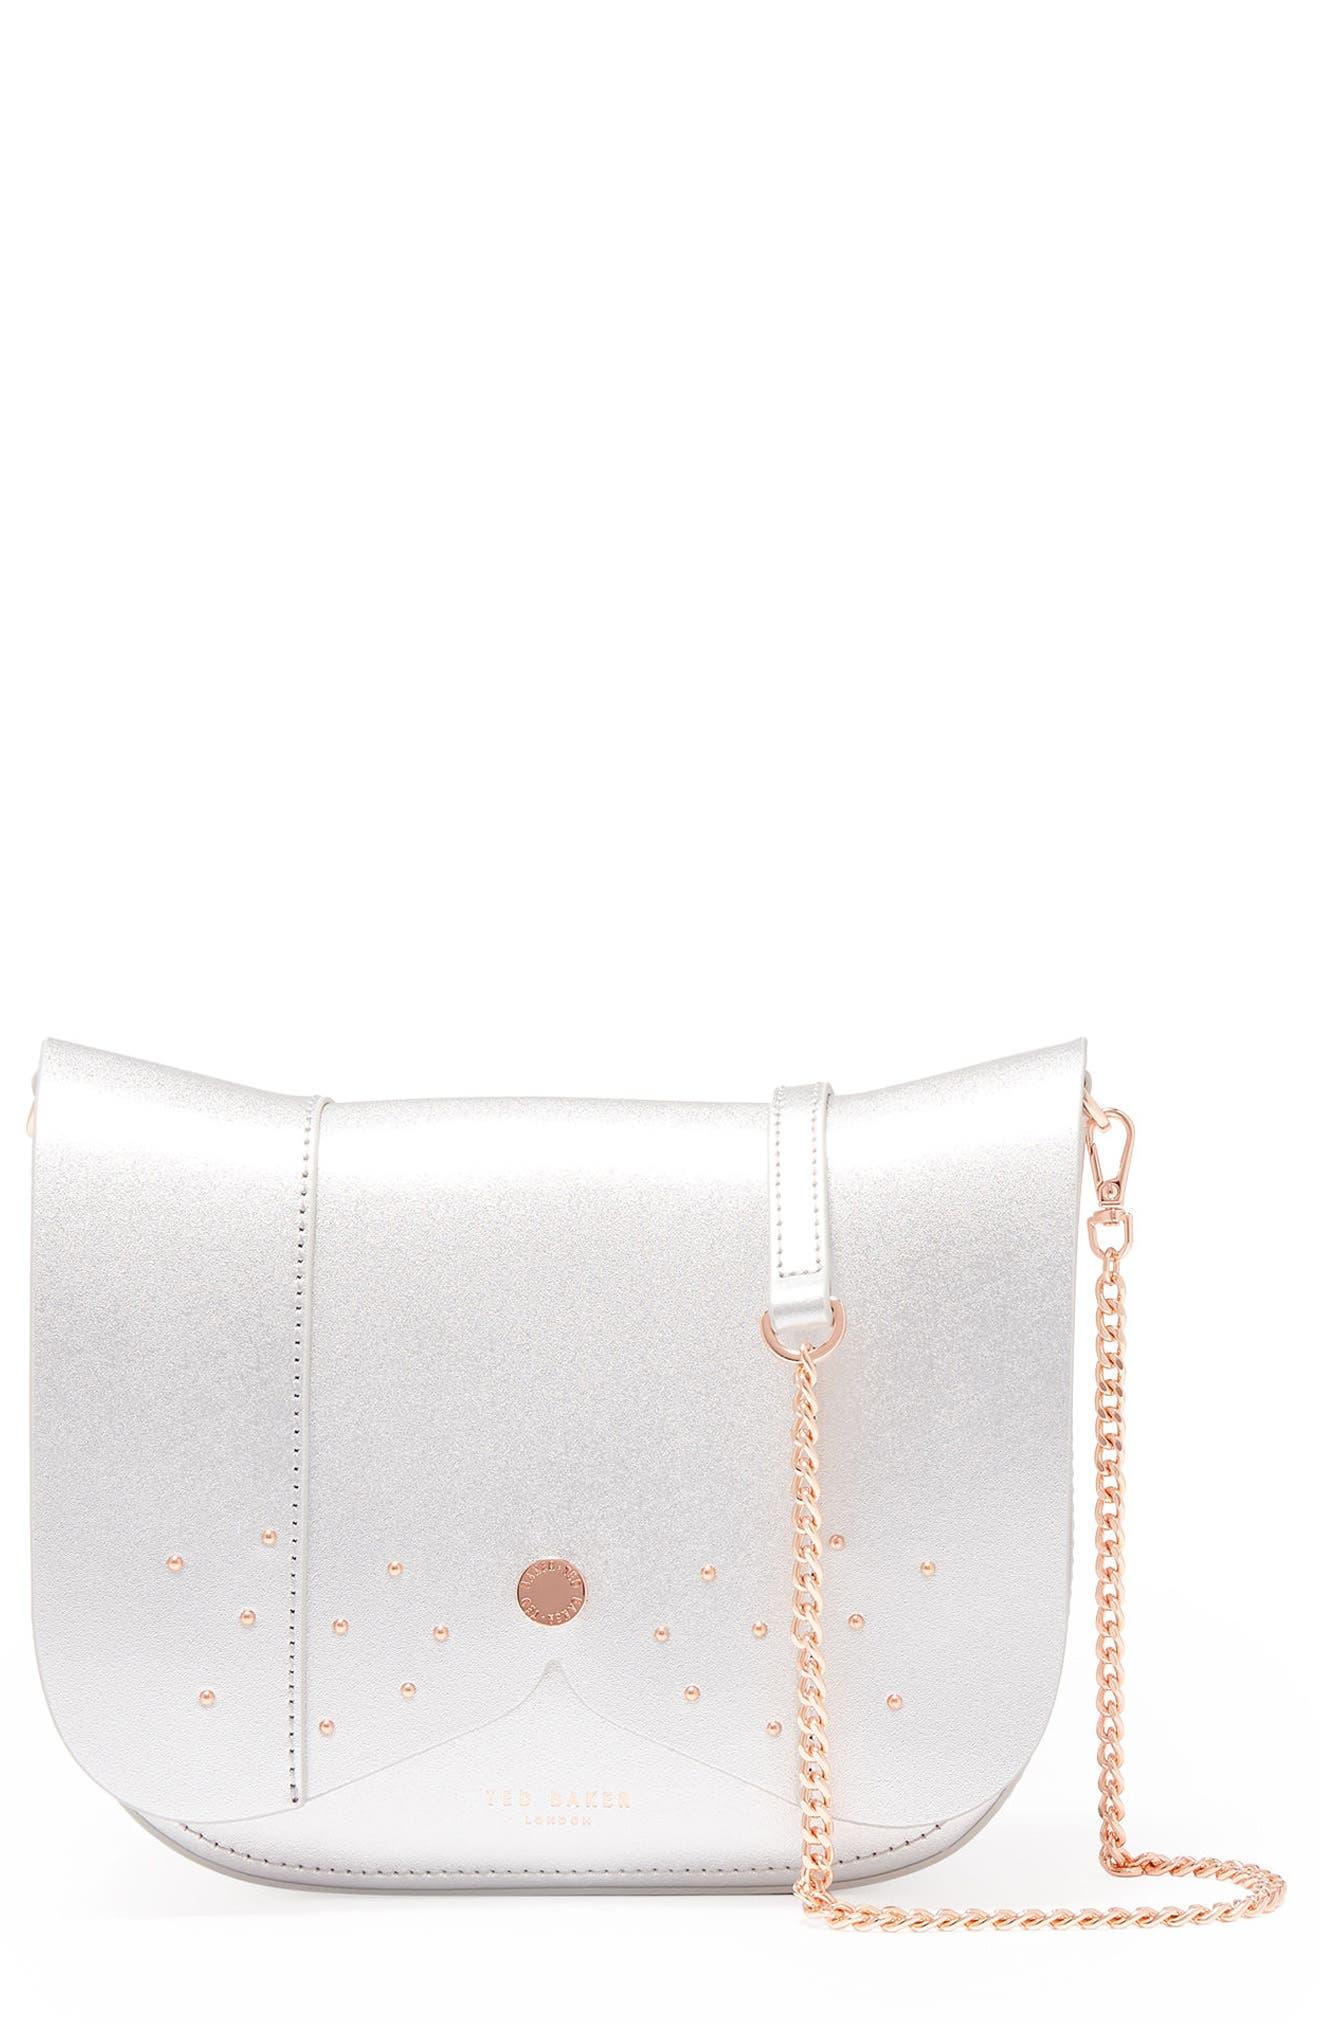 Barkley Dog Leather Crossbody Bag,                             Main thumbnail 1, color,                             020